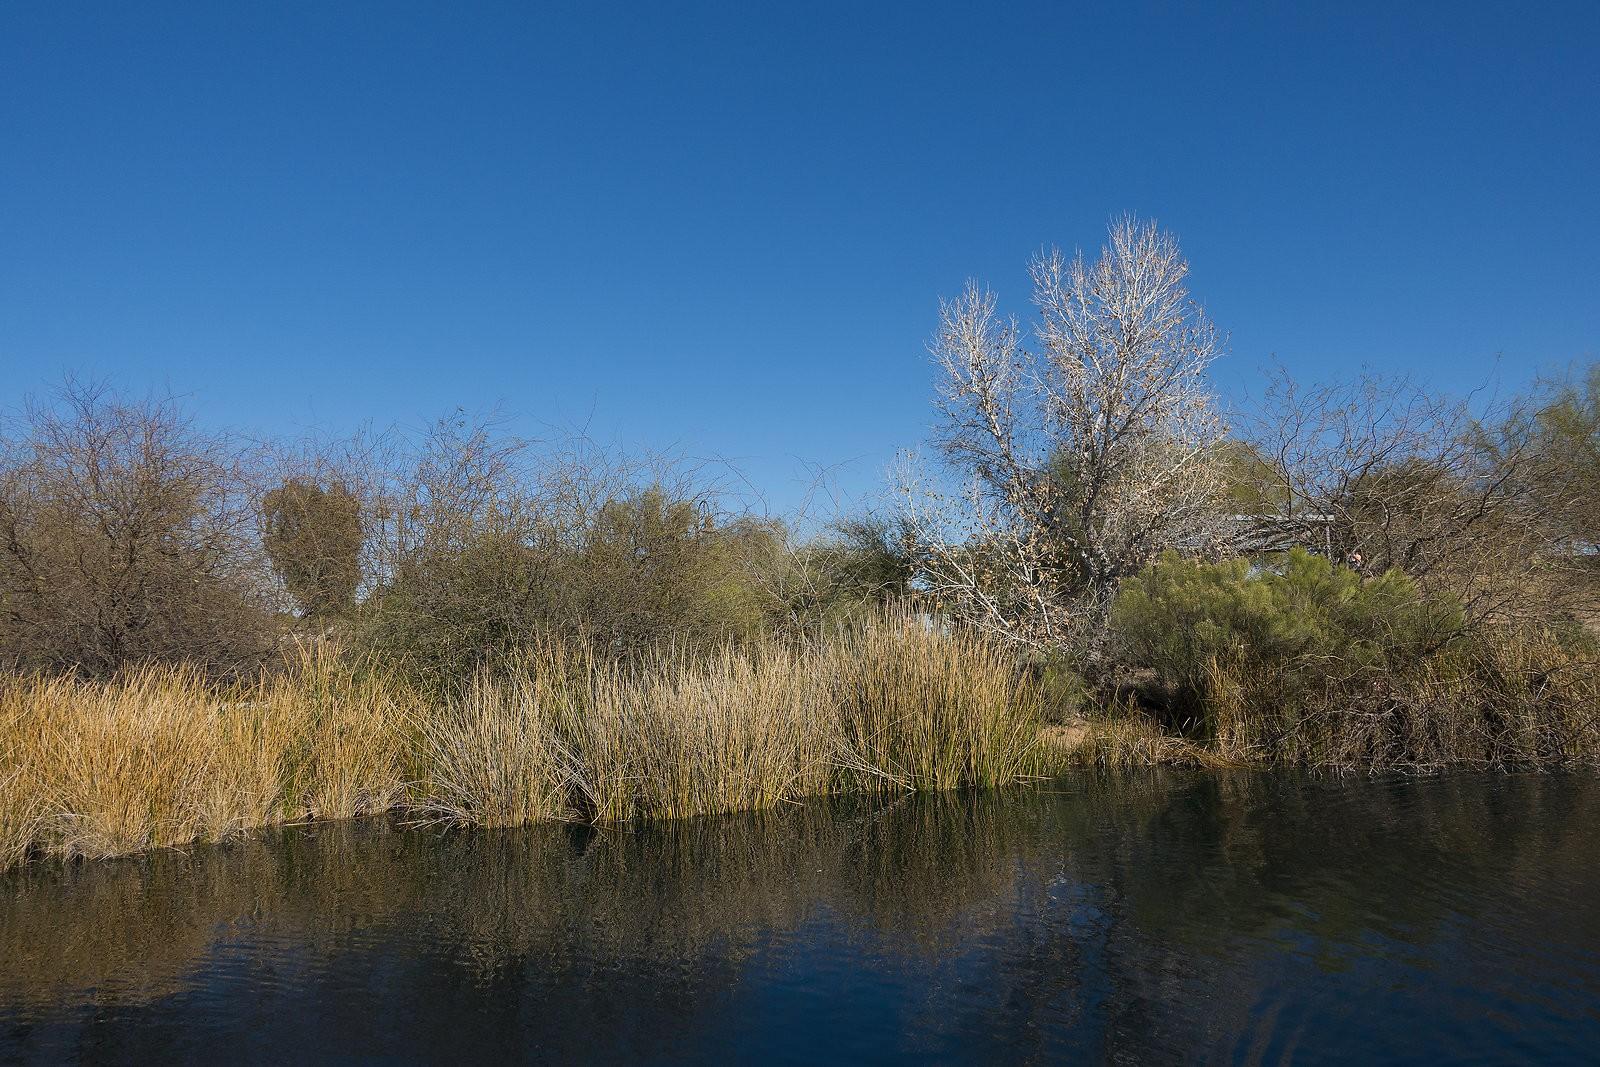 drygrass.jpg